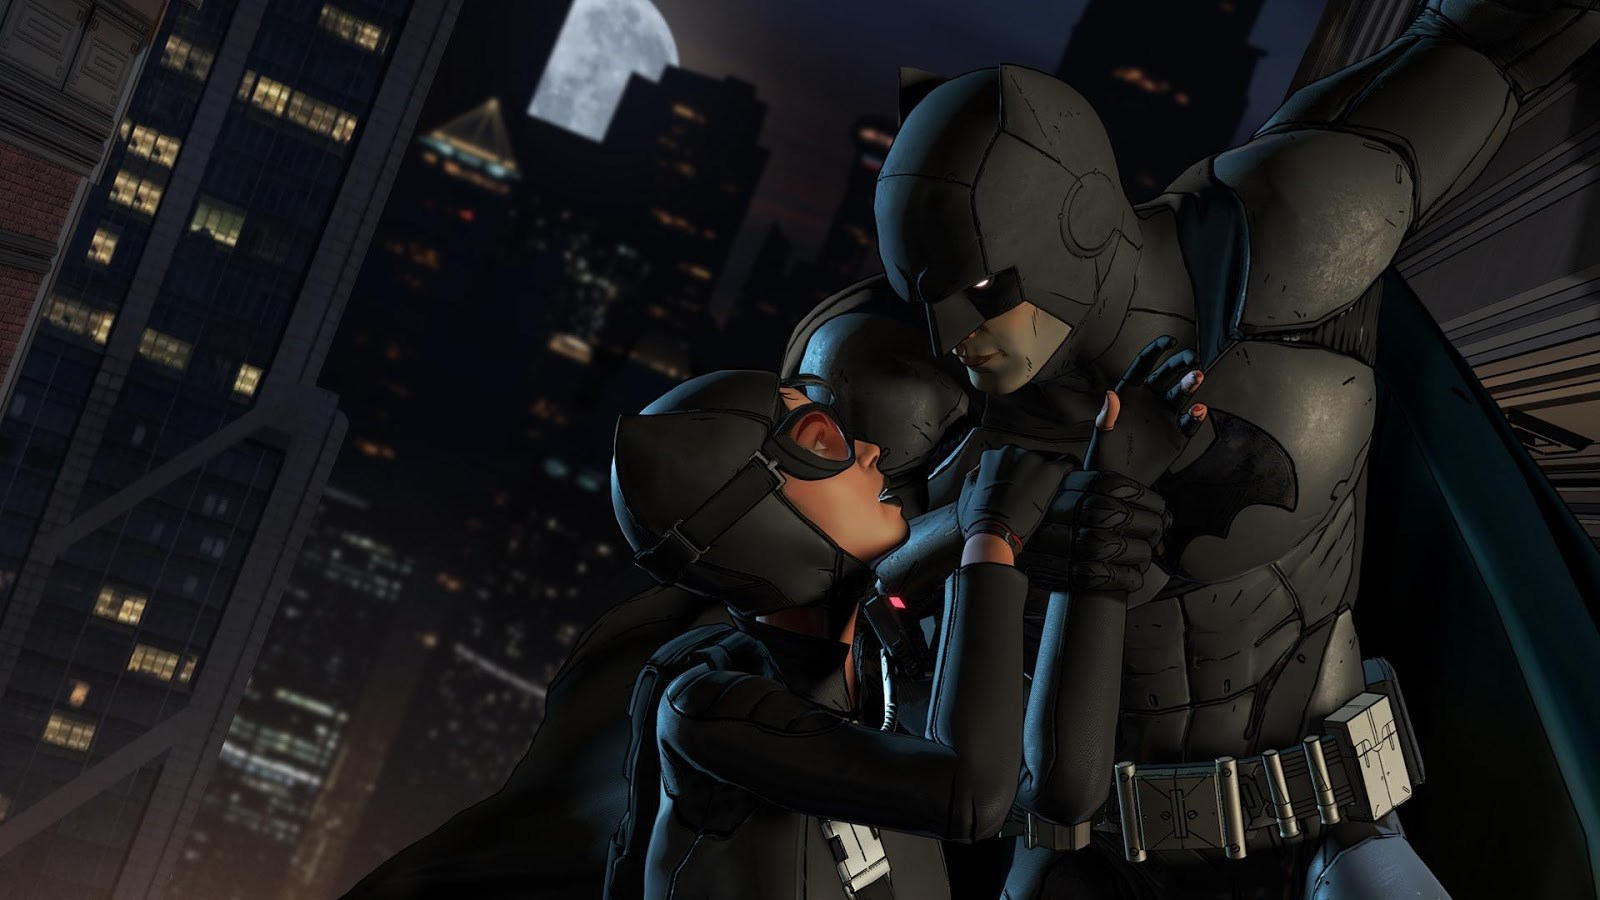 Batman - The Telltale Series Download para Android em Português Grátis